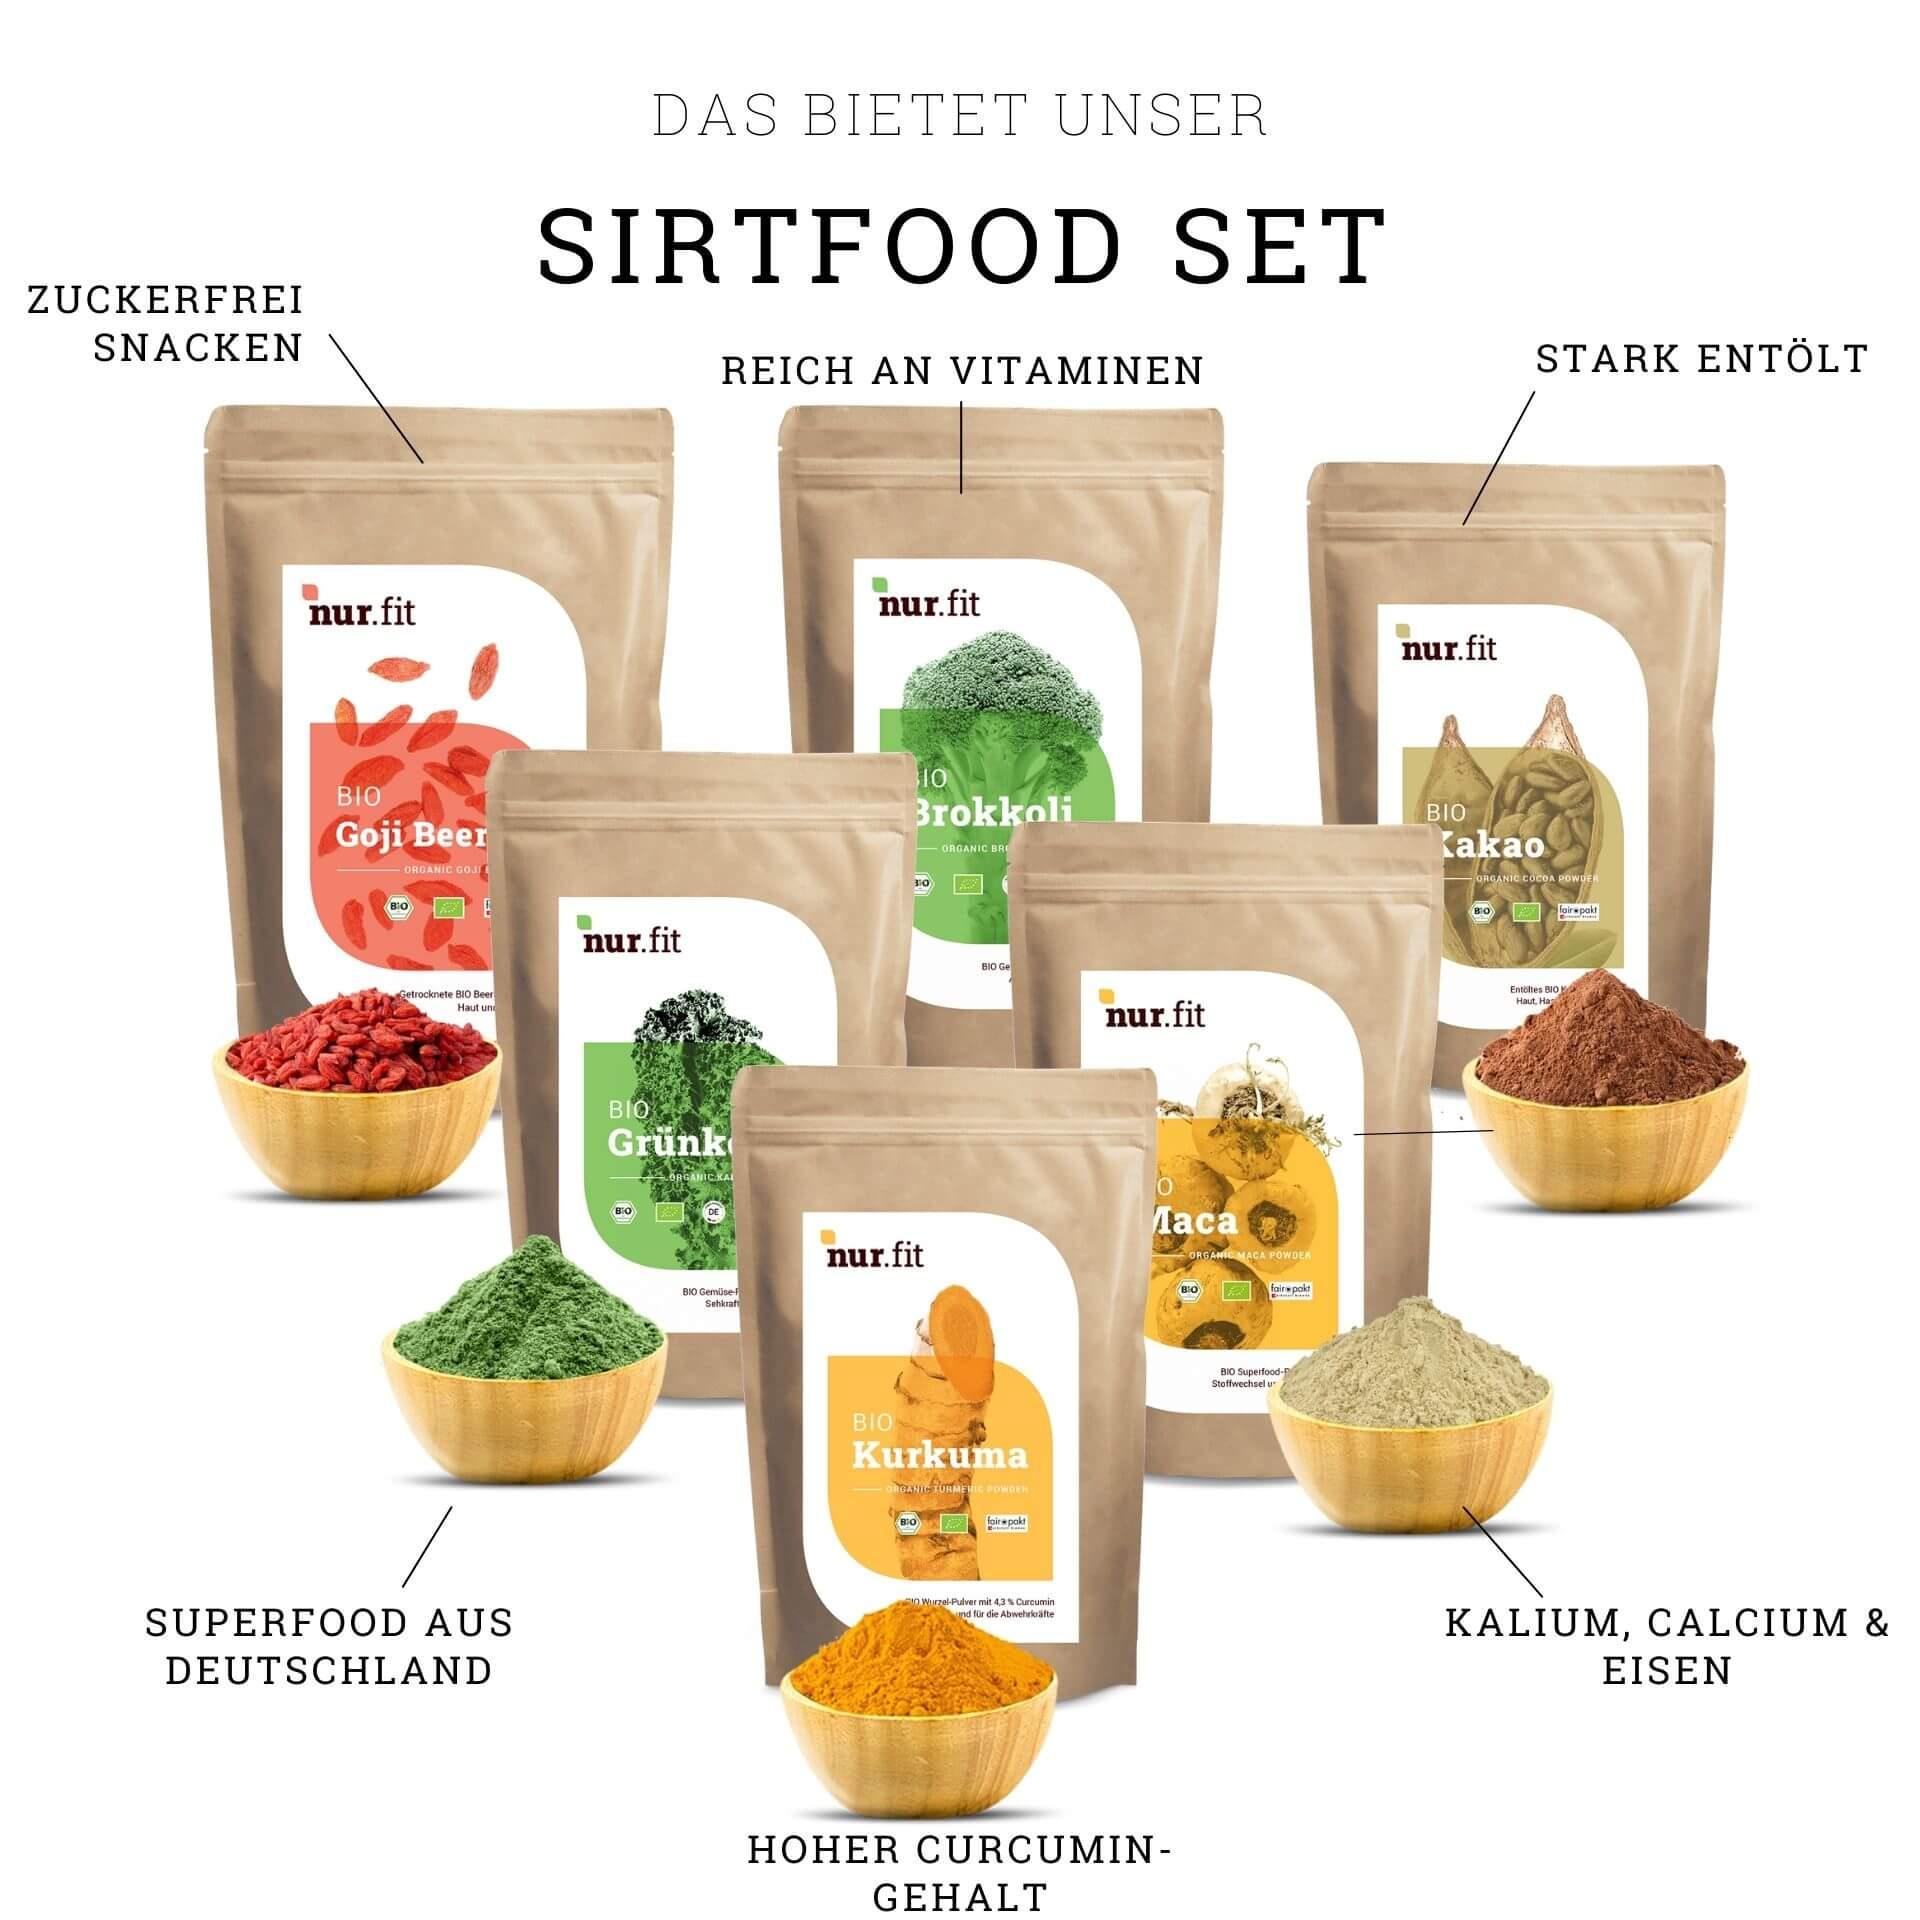 BIO Sirt-Food Set